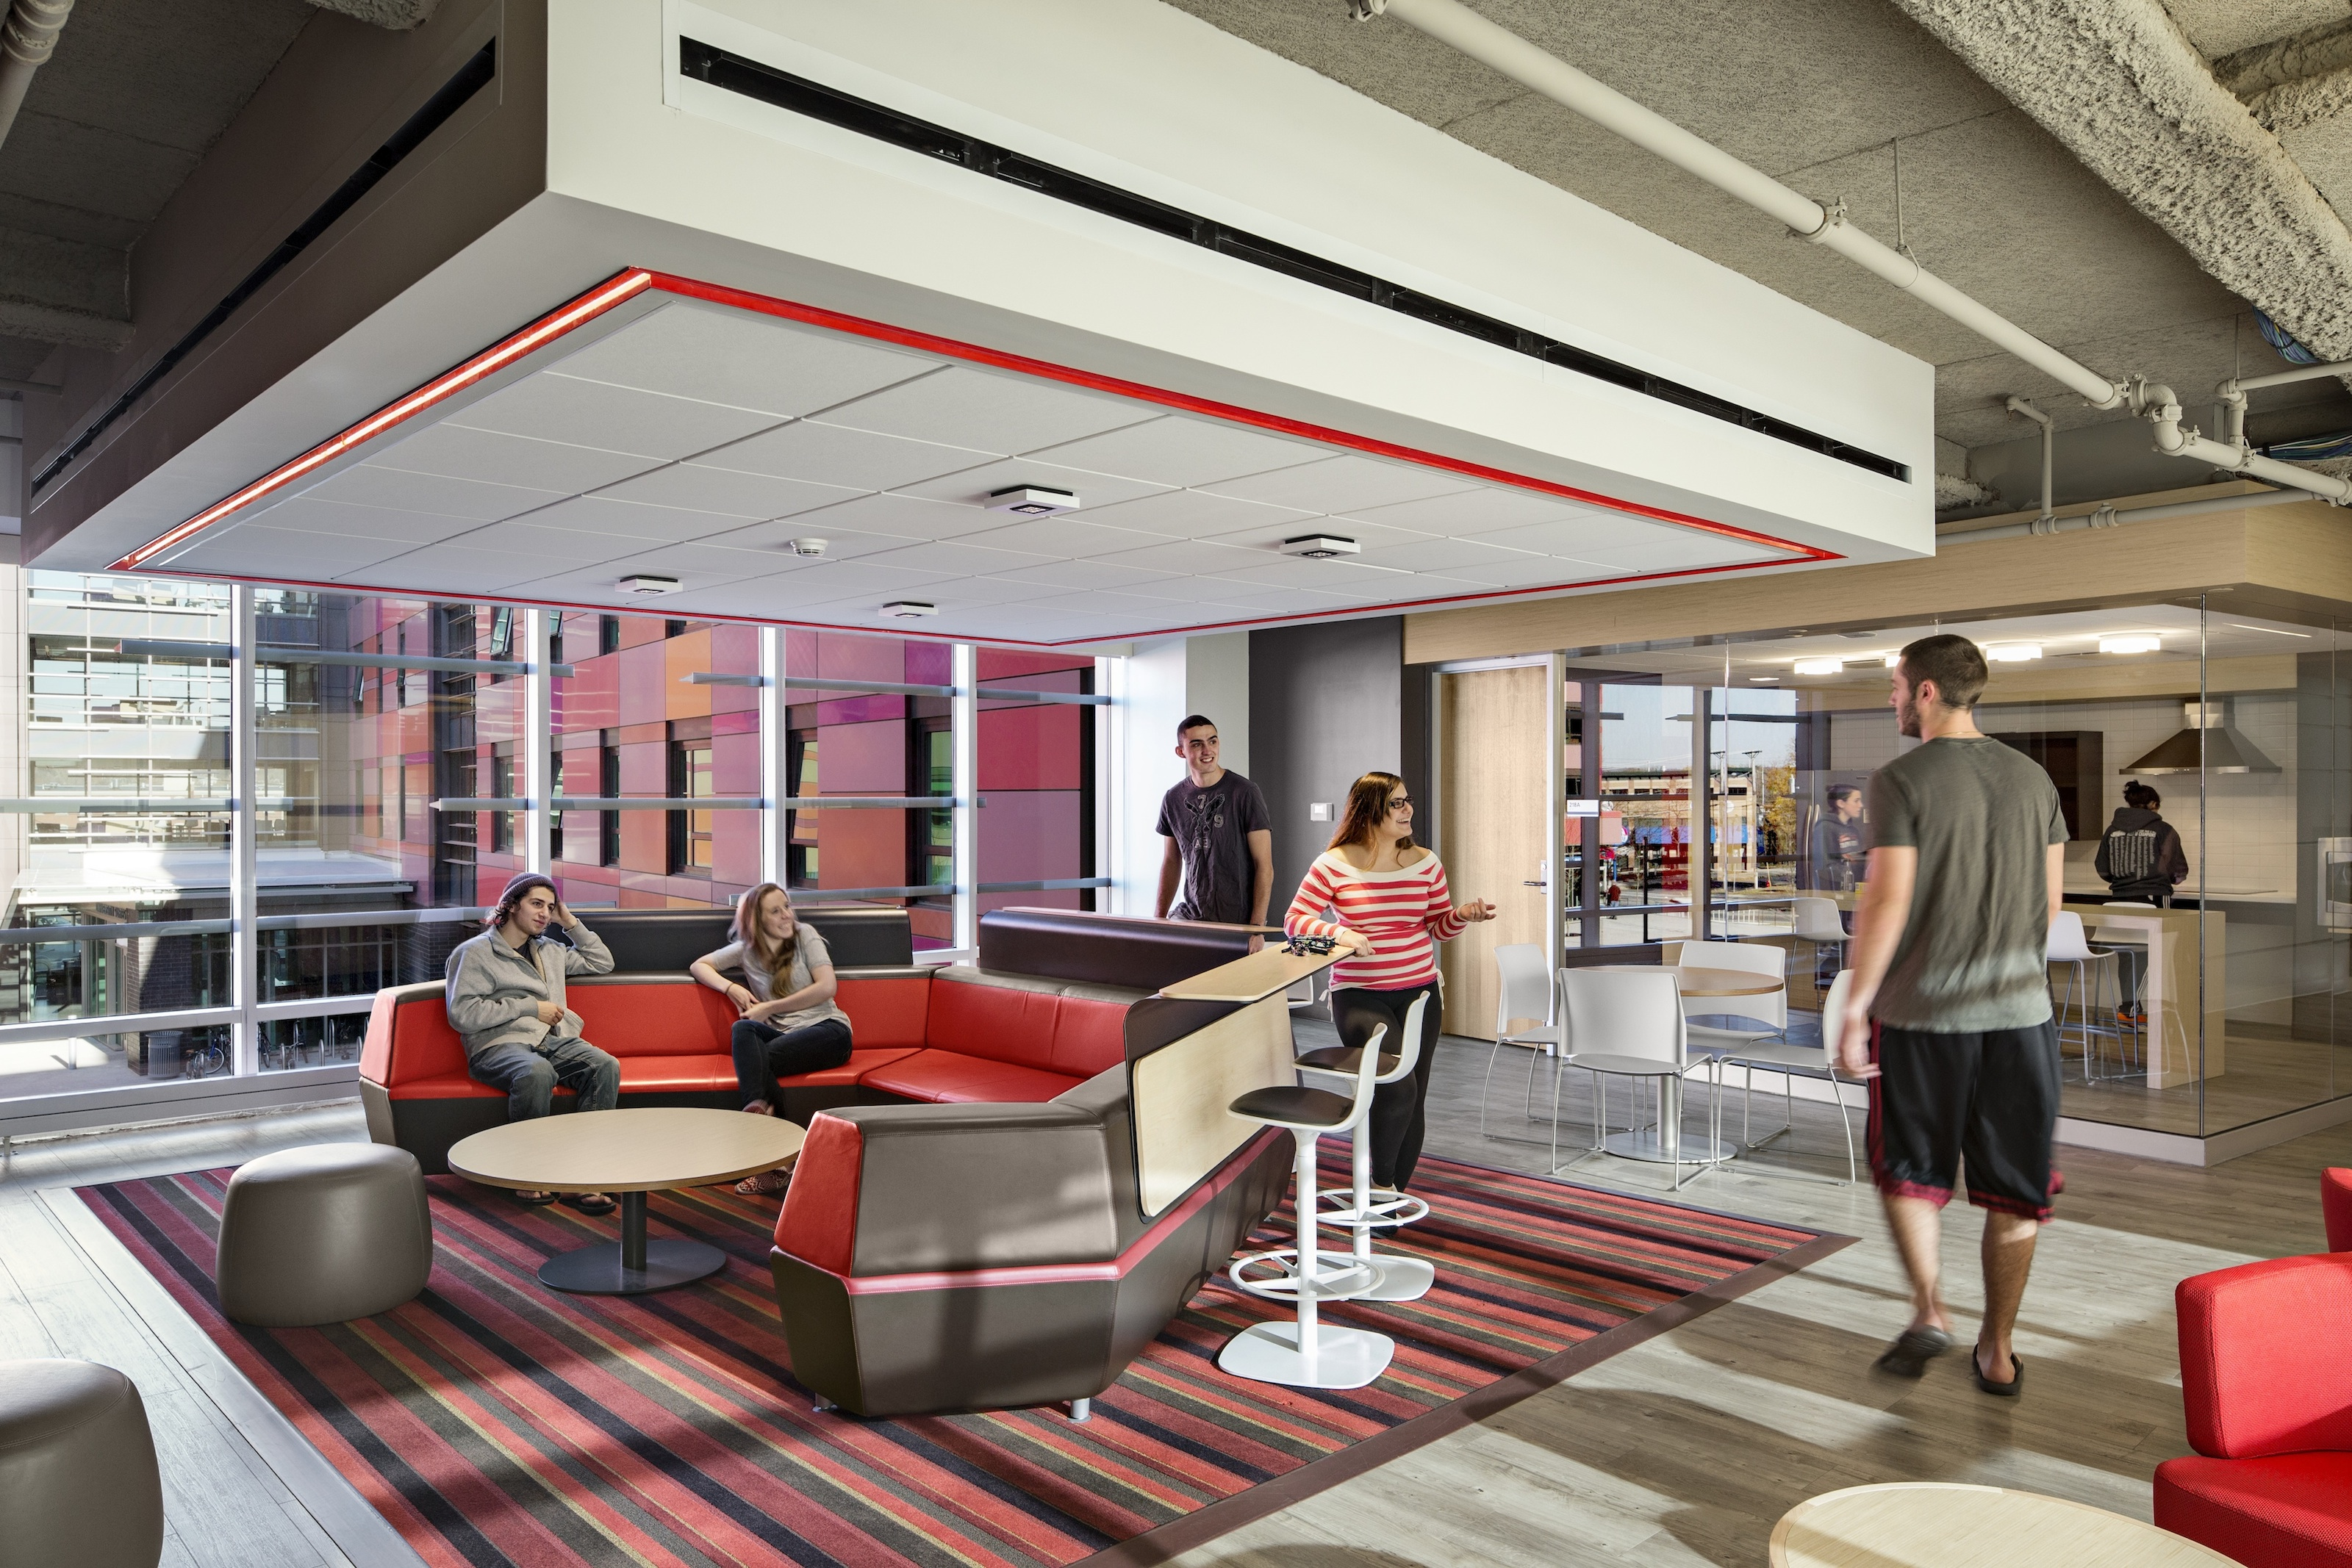 UMass Lowell's New $54 Million University Suites Designed ...